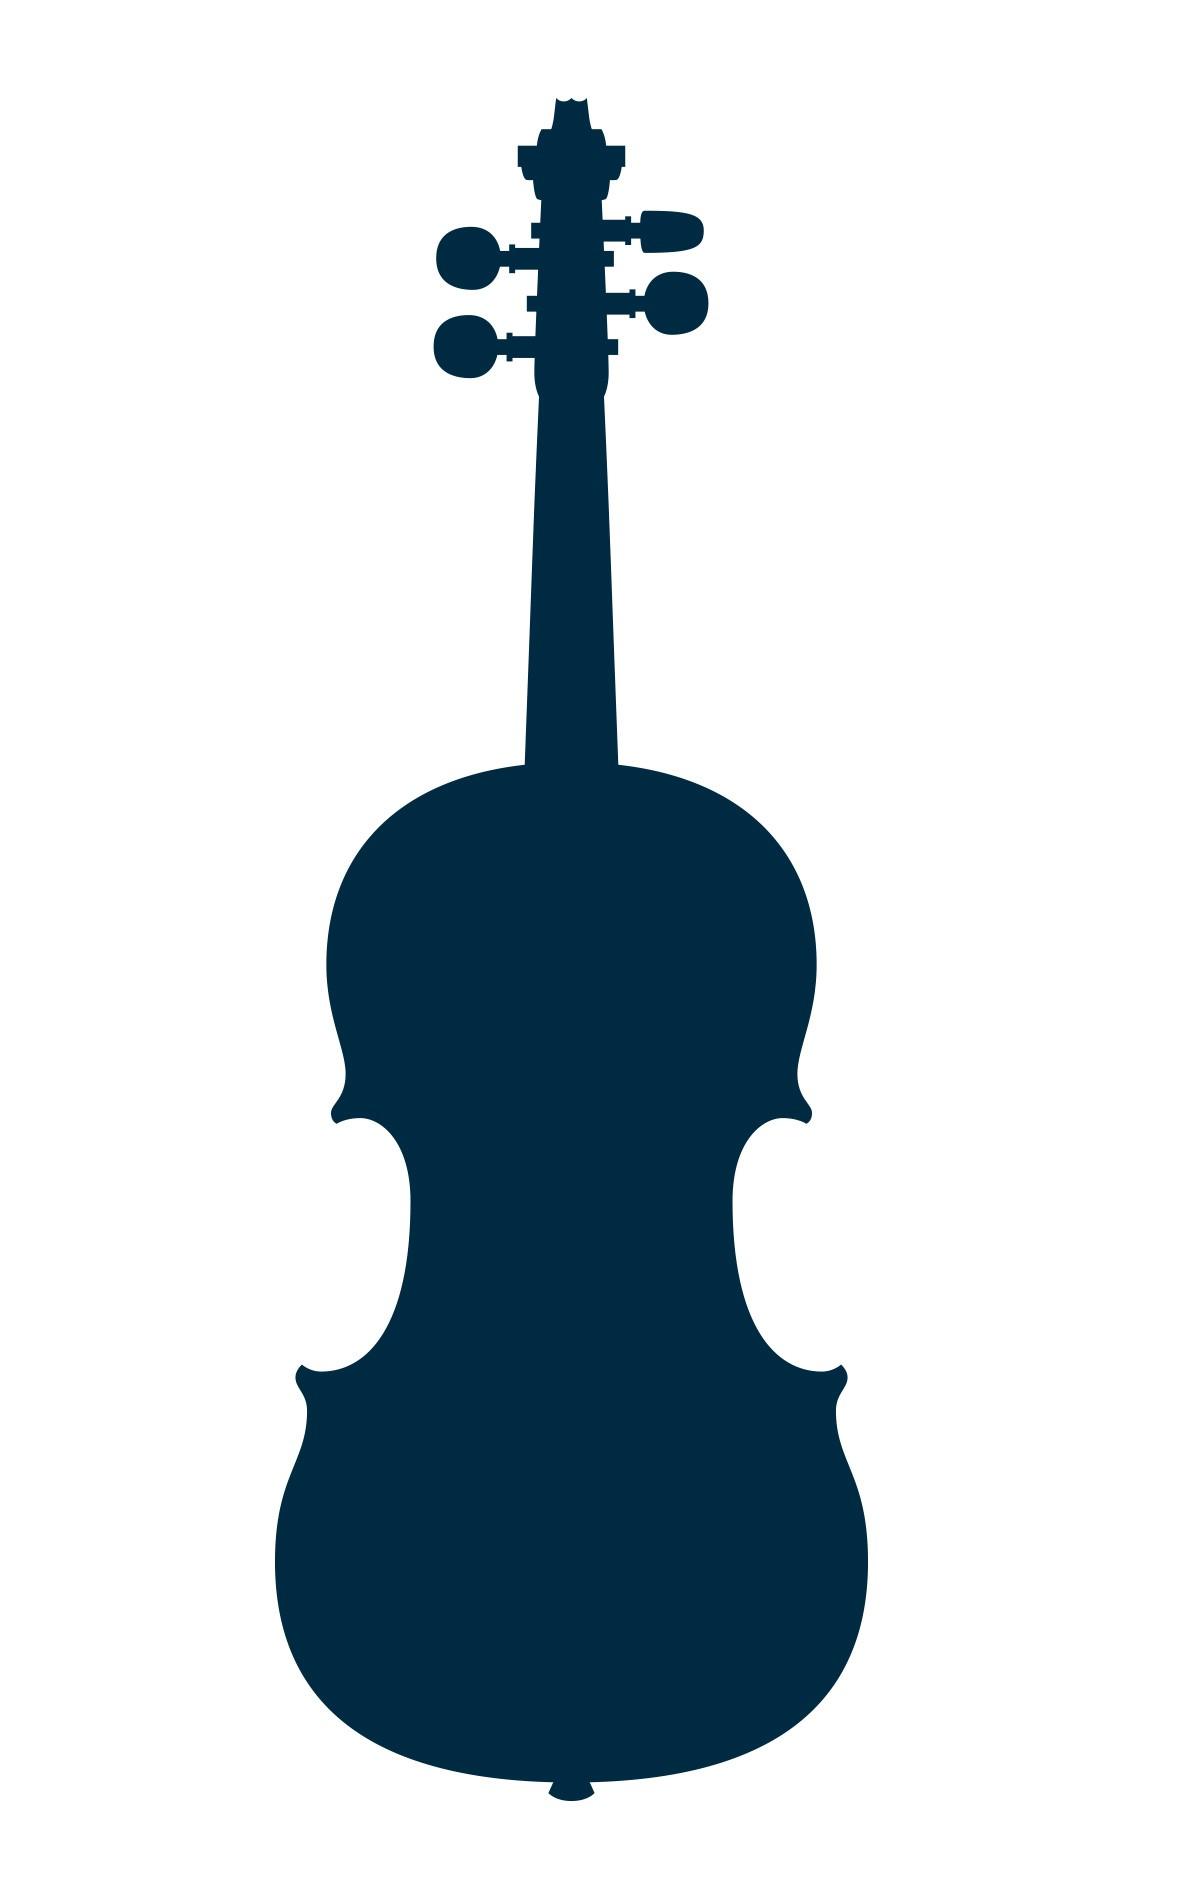 Violin by Hopf, Klingenthal